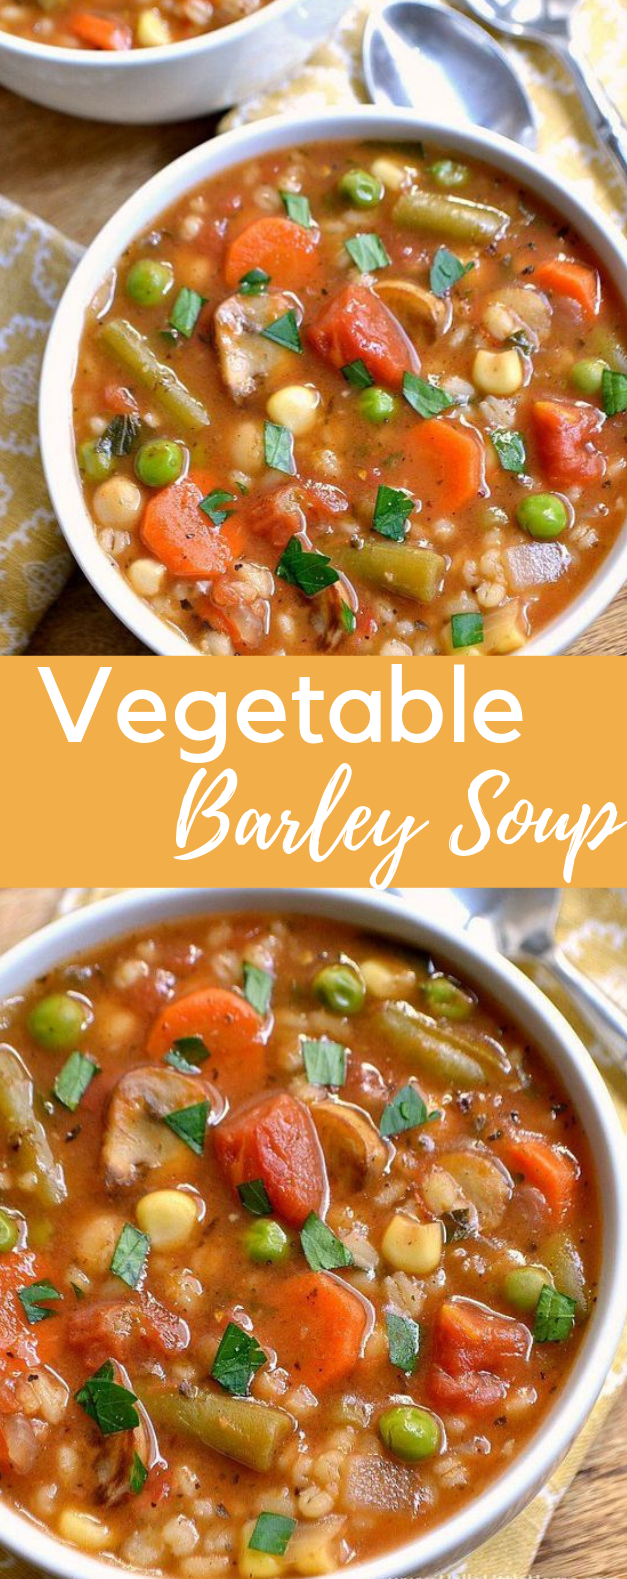 Vegetable Barley Soup #eathealthy #familyfood